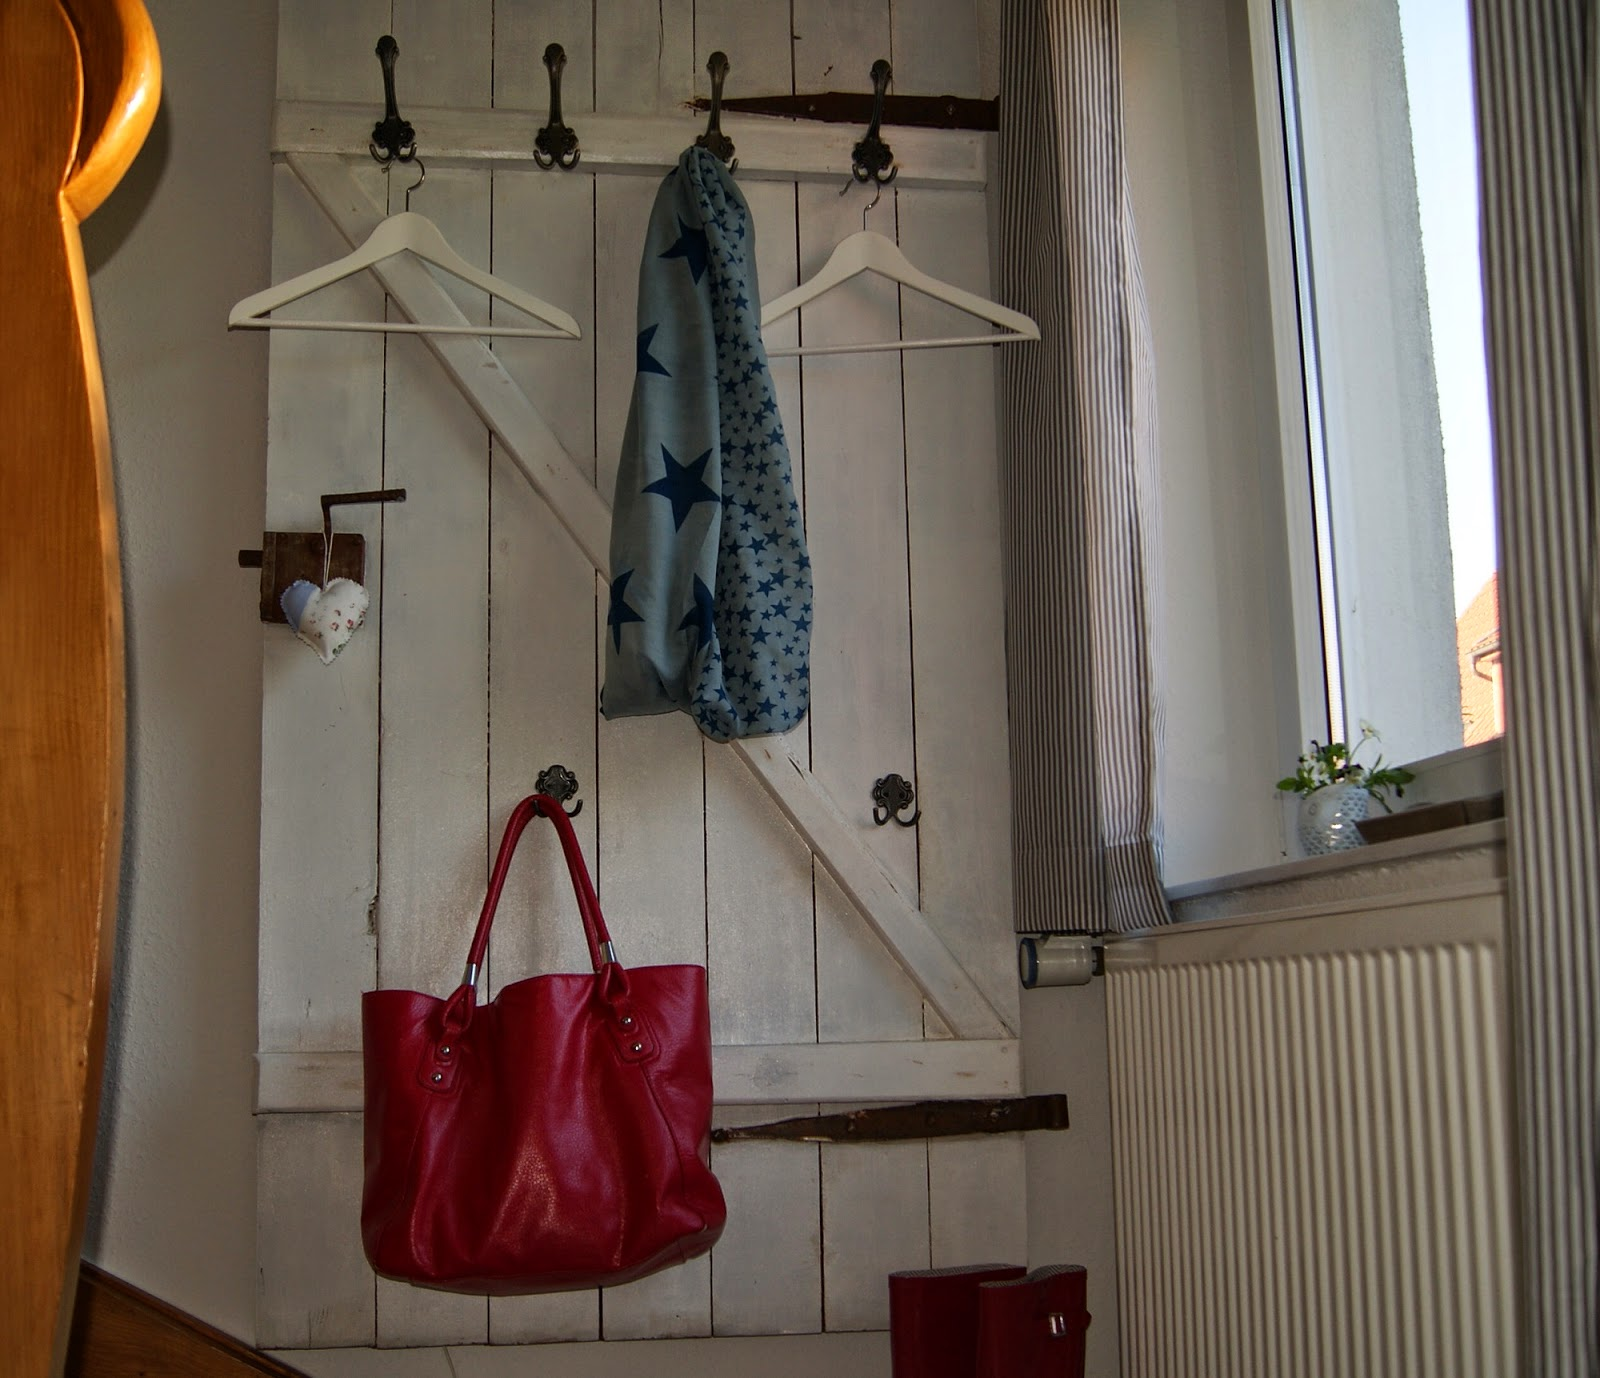 alte t r als garderobe alte t r als garderobe vorraum pinterest ps 1001 ideen f r alte t ren. Black Bedroom Furniture Sets. Home Design Ideas